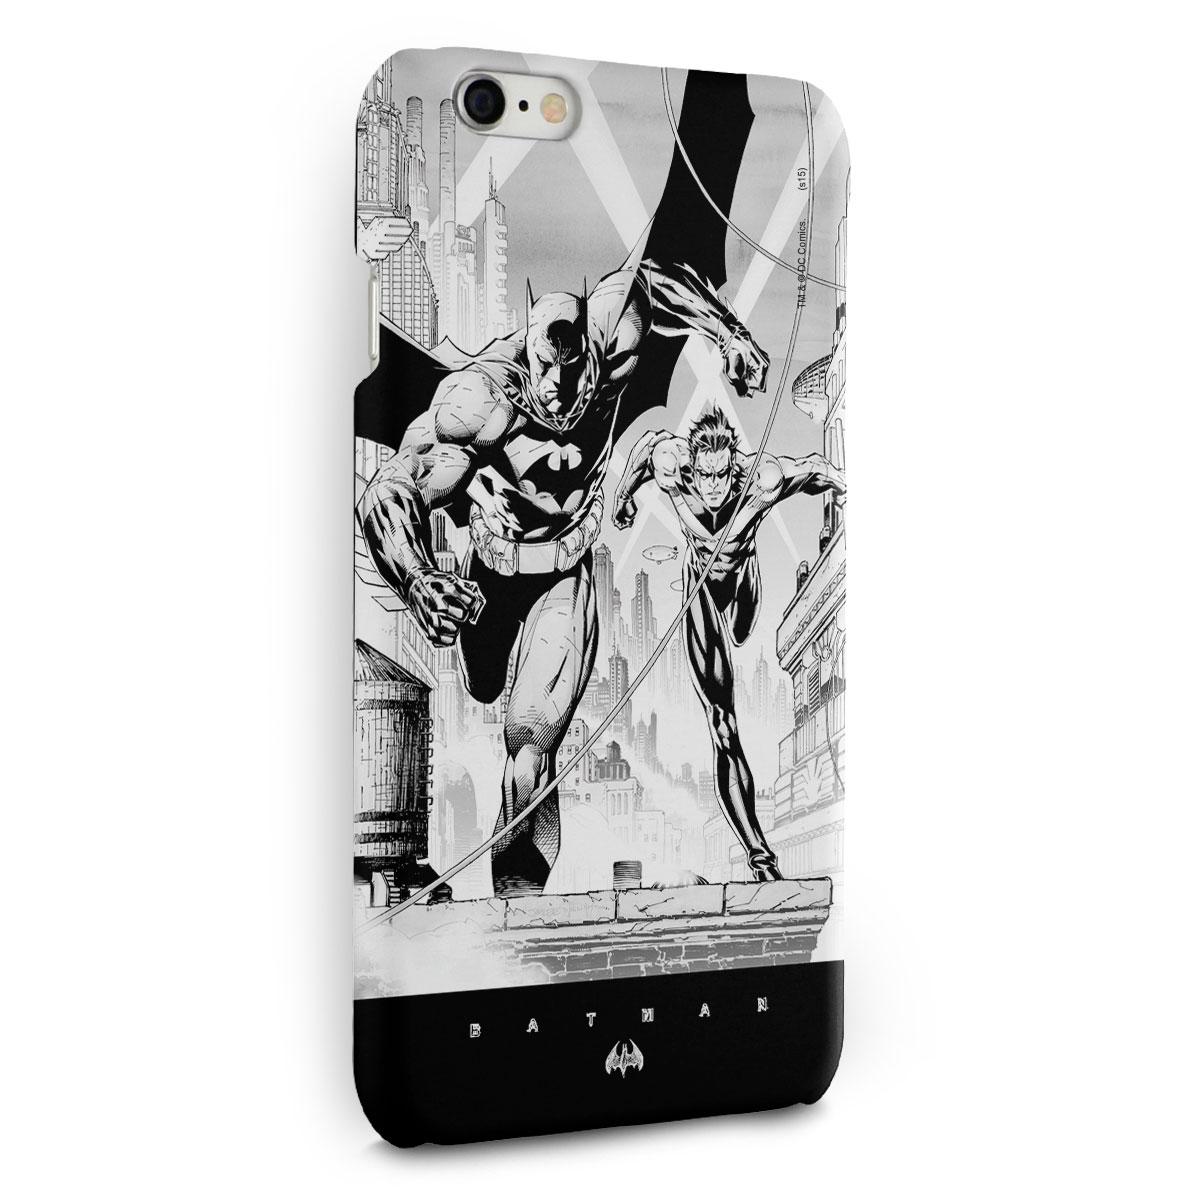 Capa para iPhone 6/6S Plus Tracing Batman e Robin